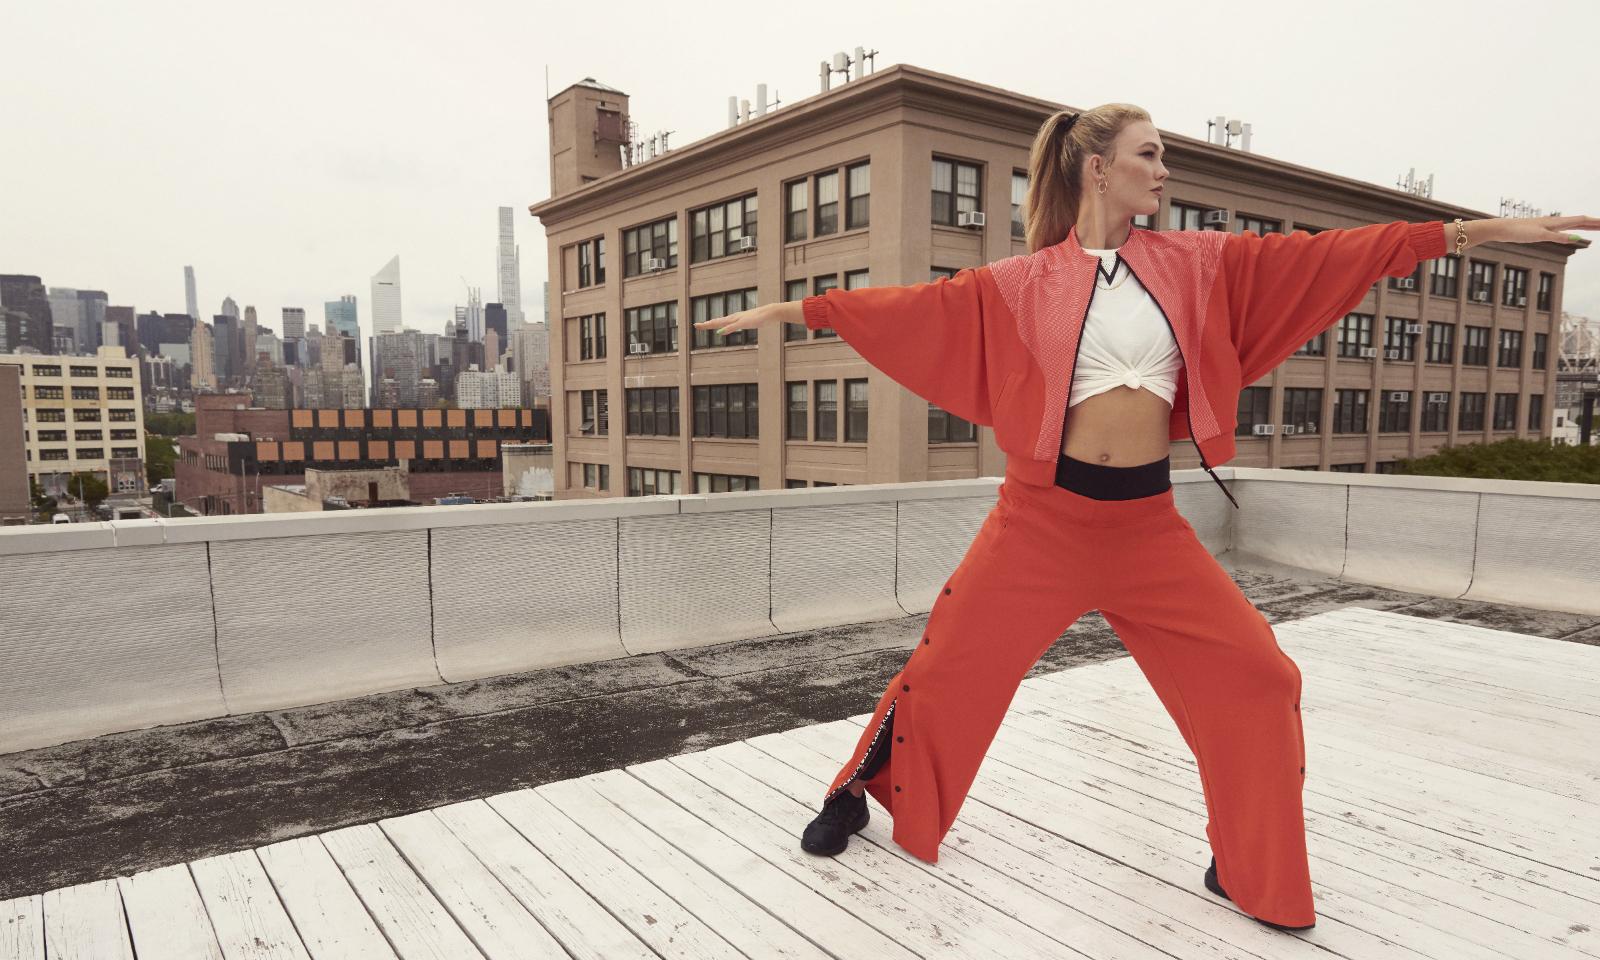 adidas 携手超模 Karlie Kloss 推出首个联名系列